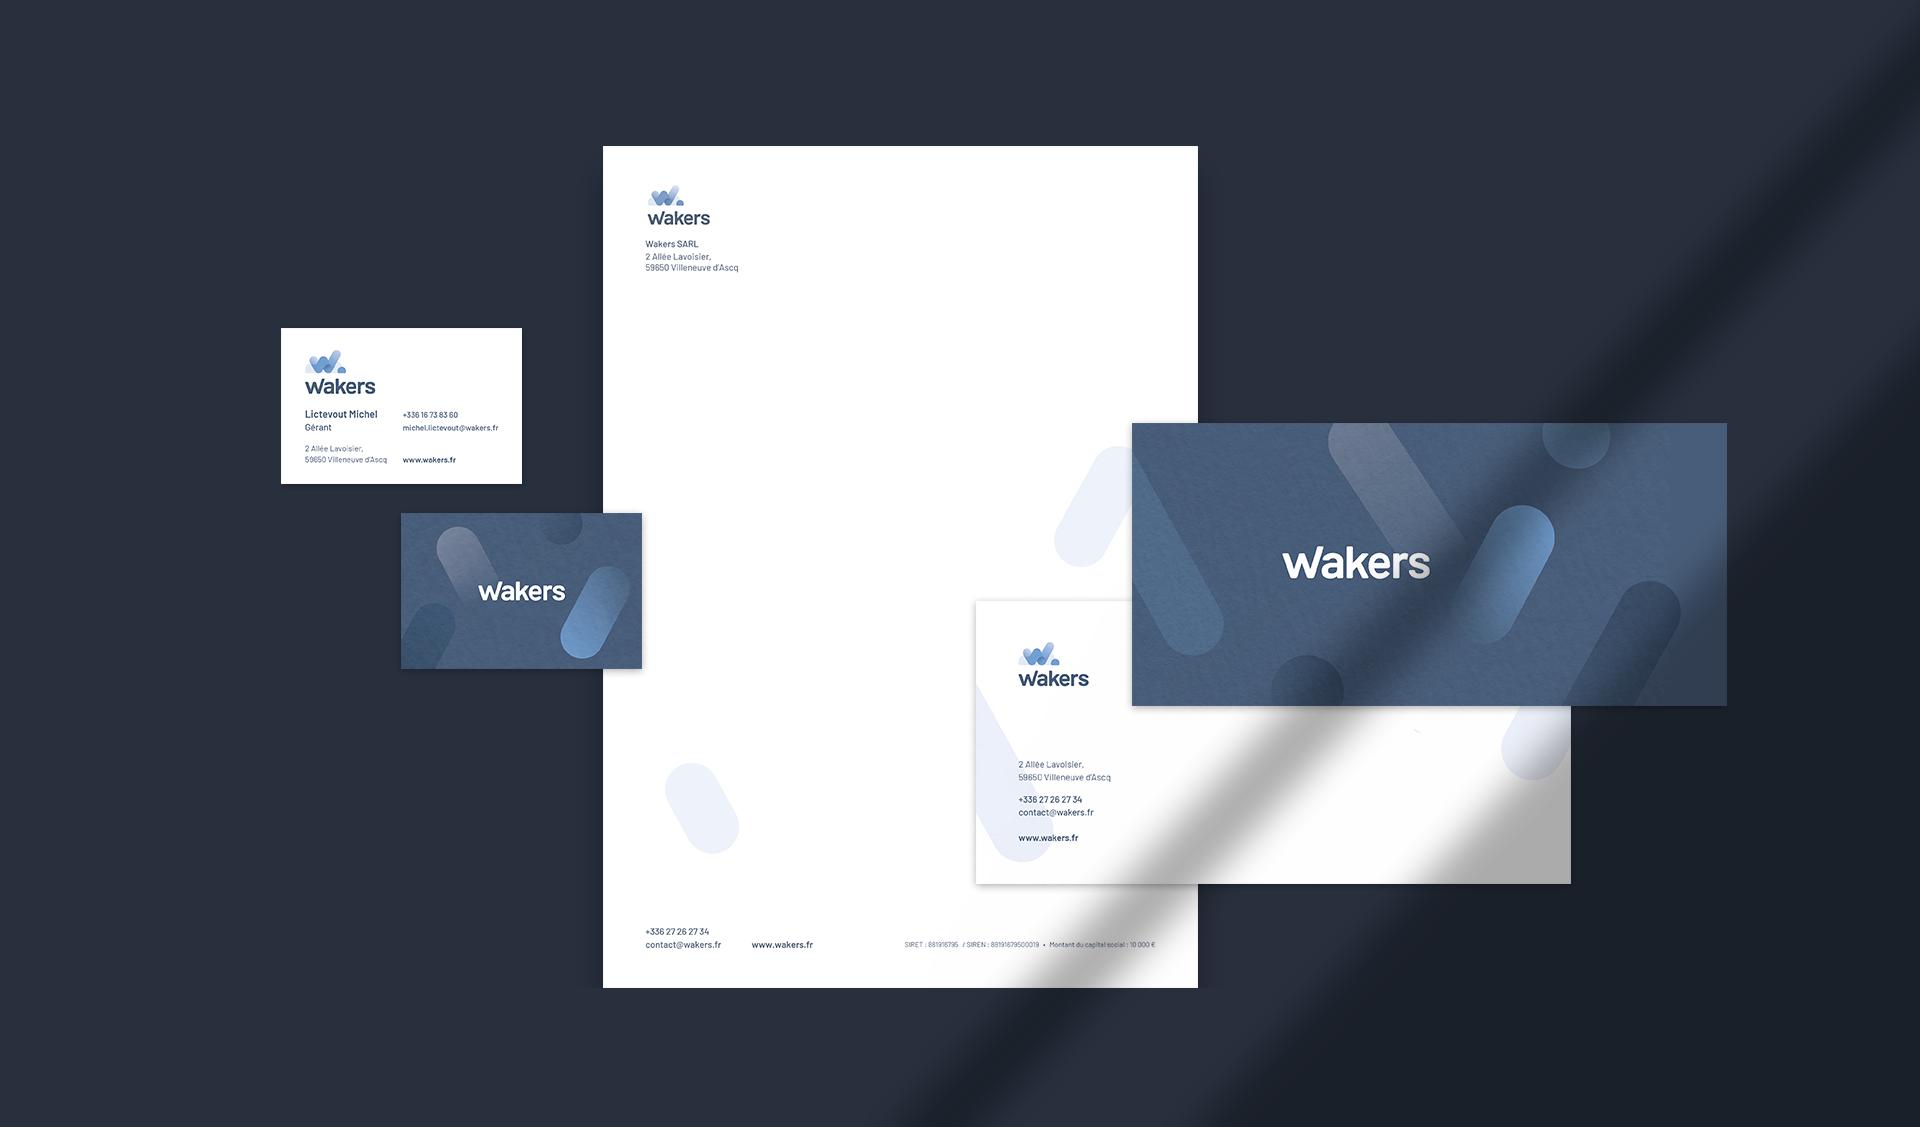 cWakers-logo-copie-1